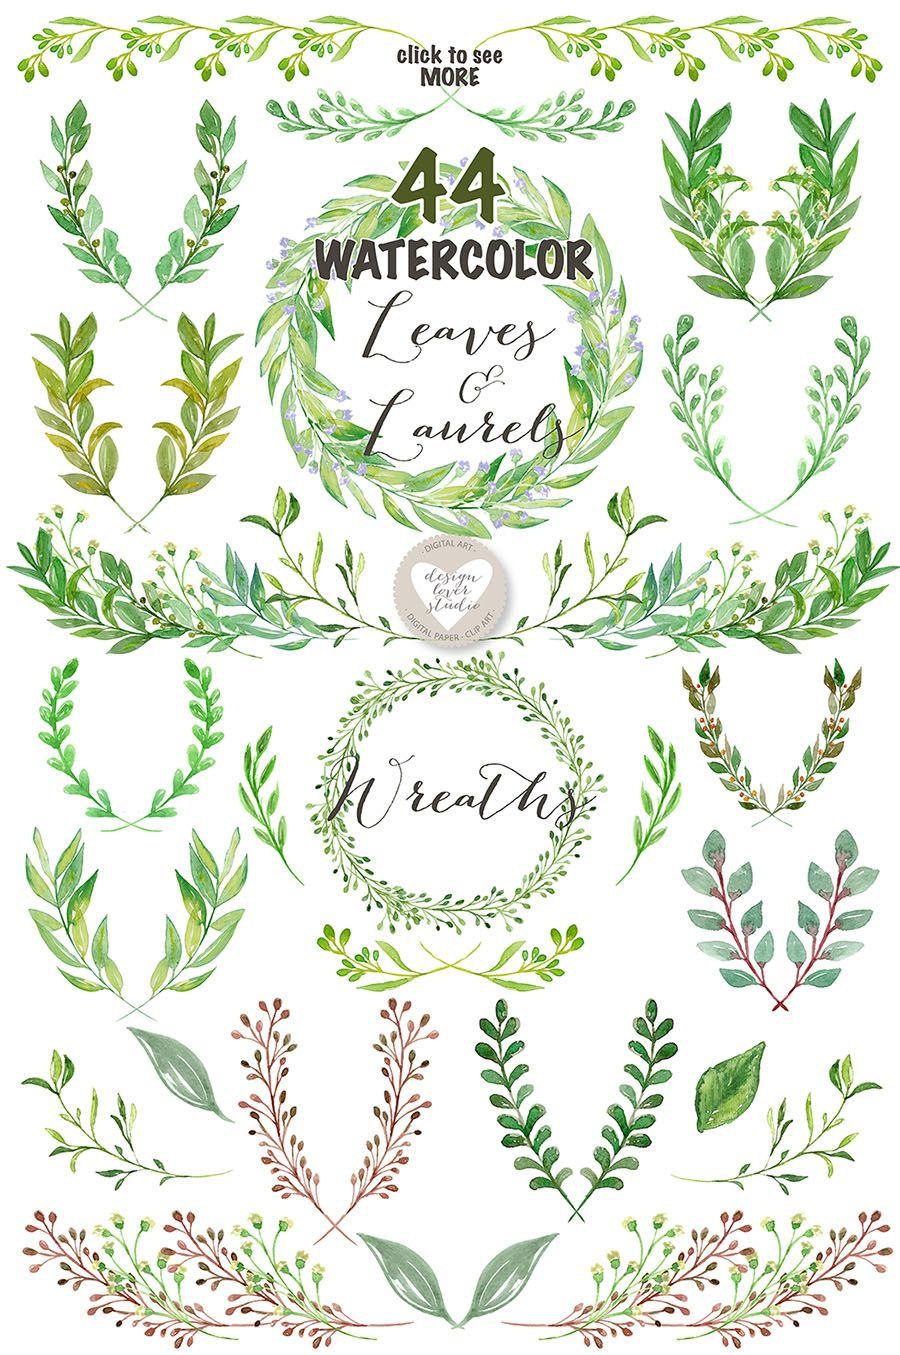 Watercolor Leaves, Laurel and Wreath